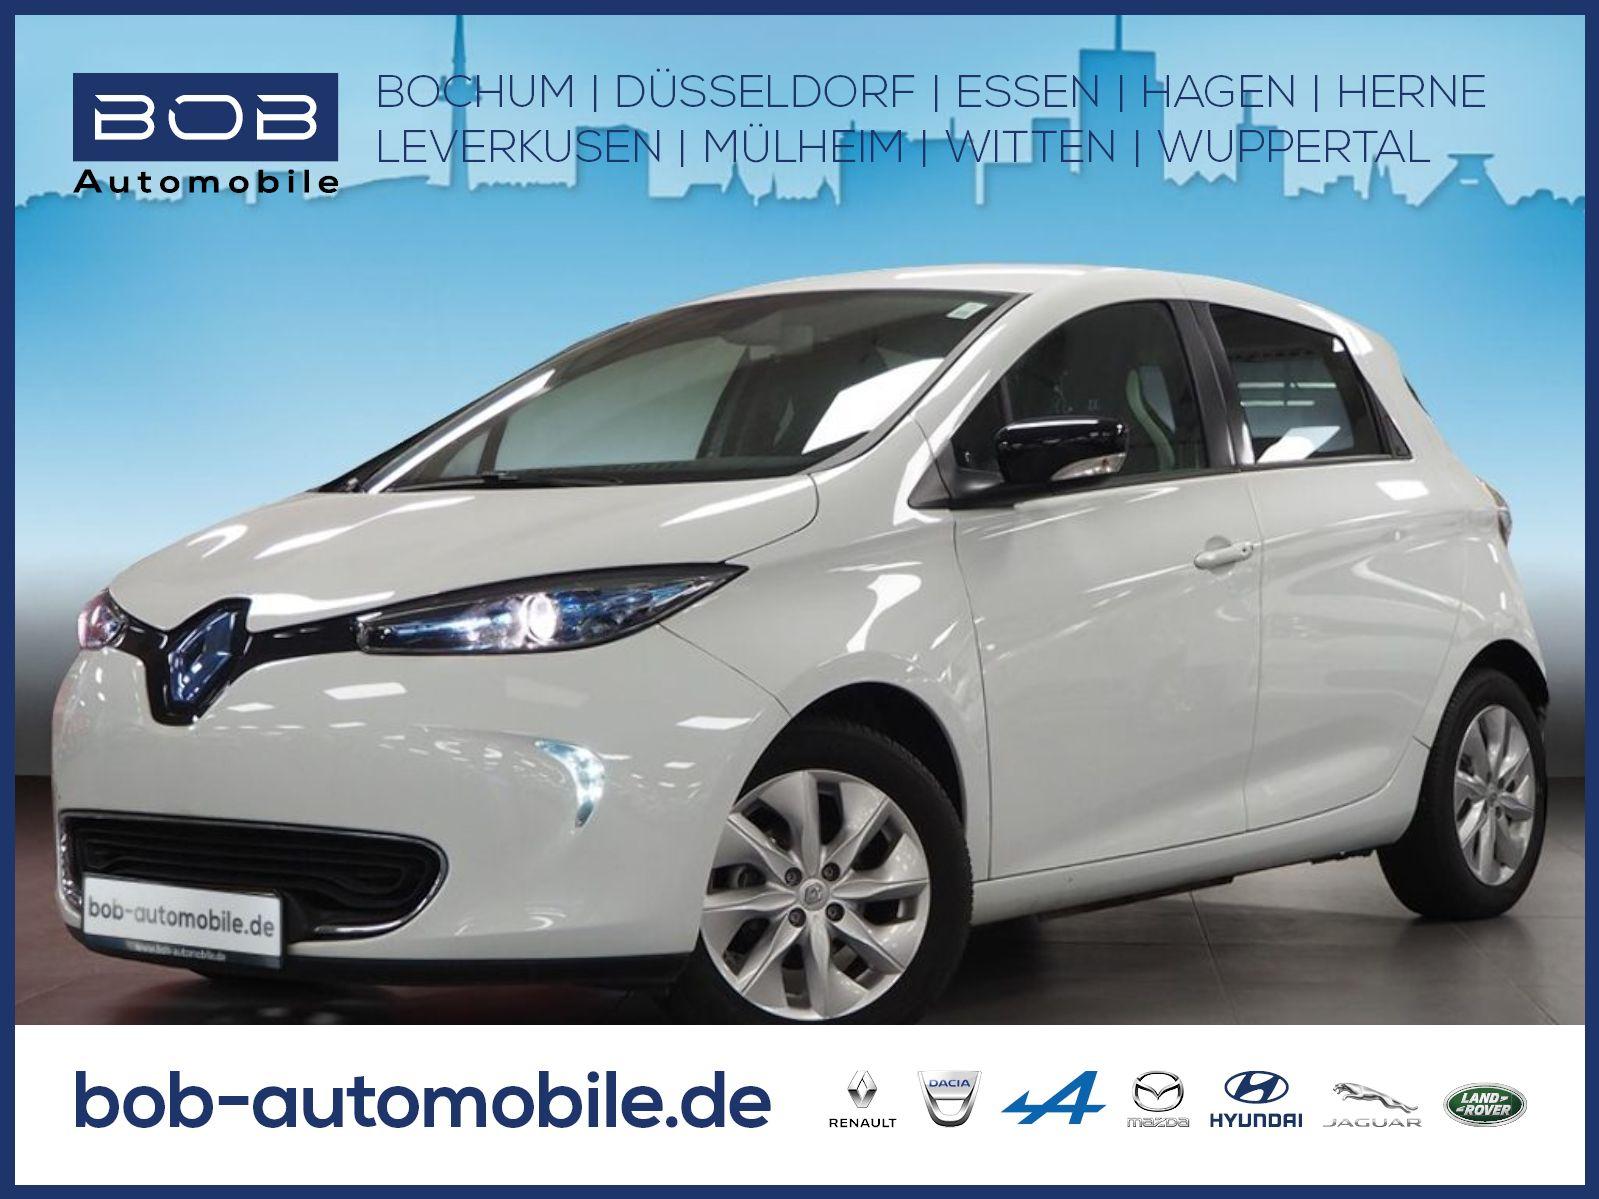 Renault ZOE INTENS R240 NAVI PDC KLIMA LM-Felgen BT AUX, Jahr 2016, Elektro